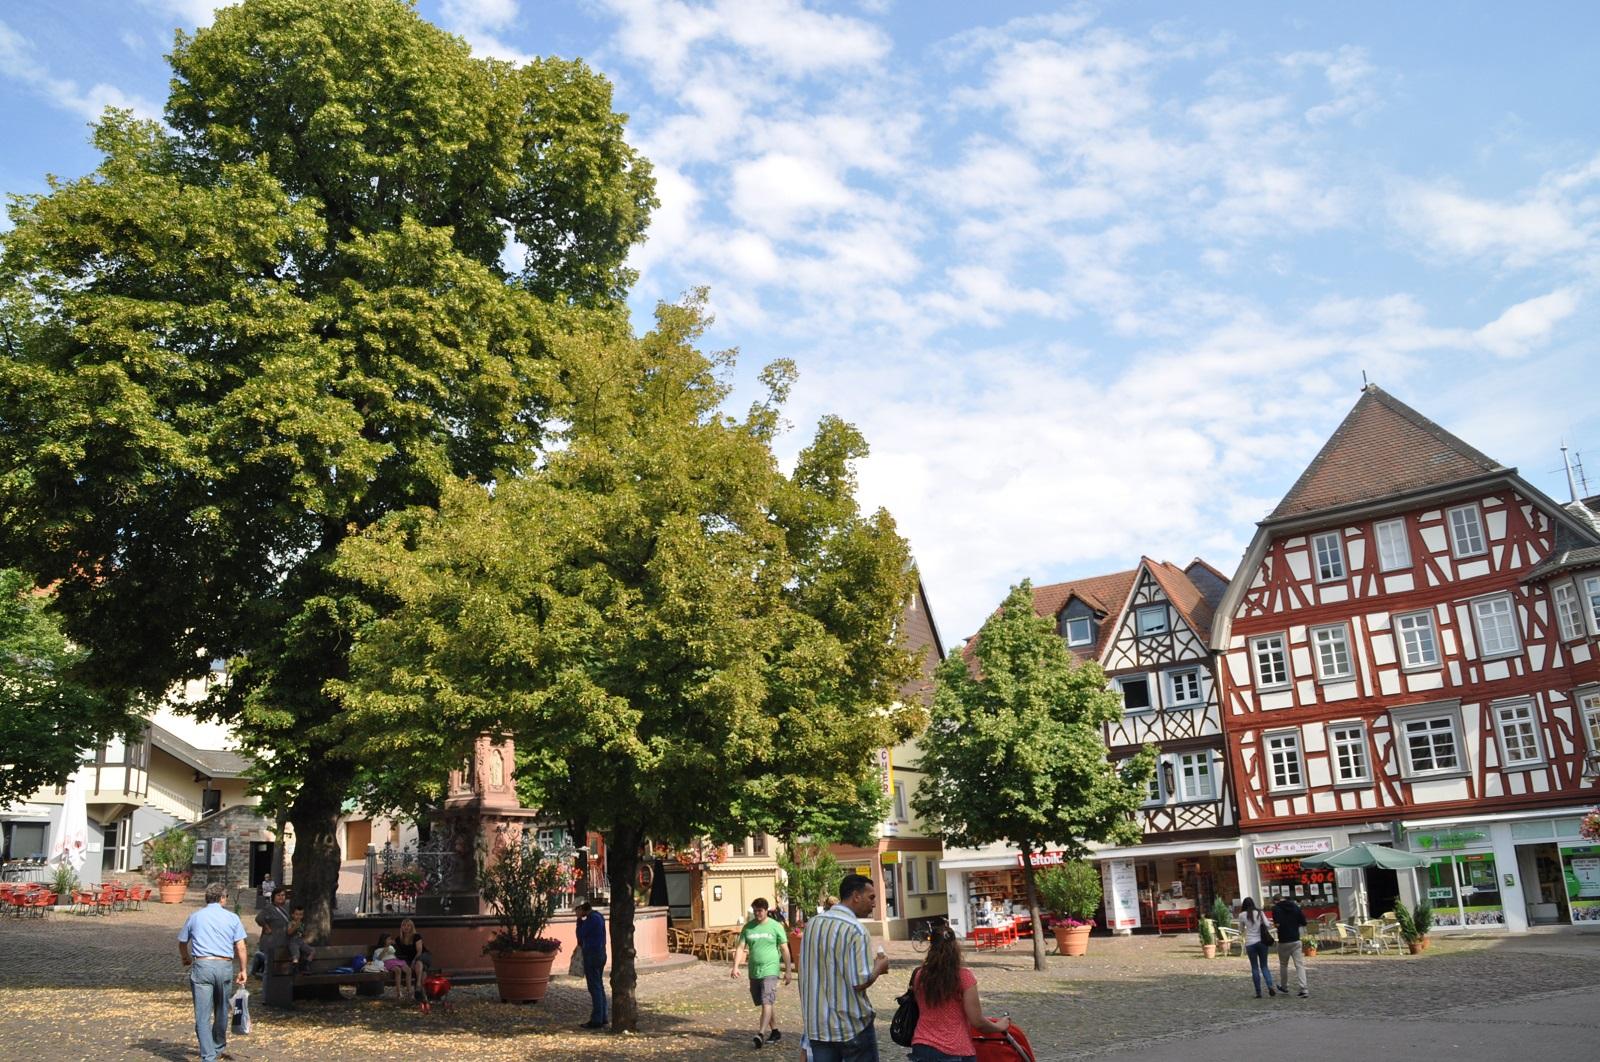 Marktplatz Bensheim